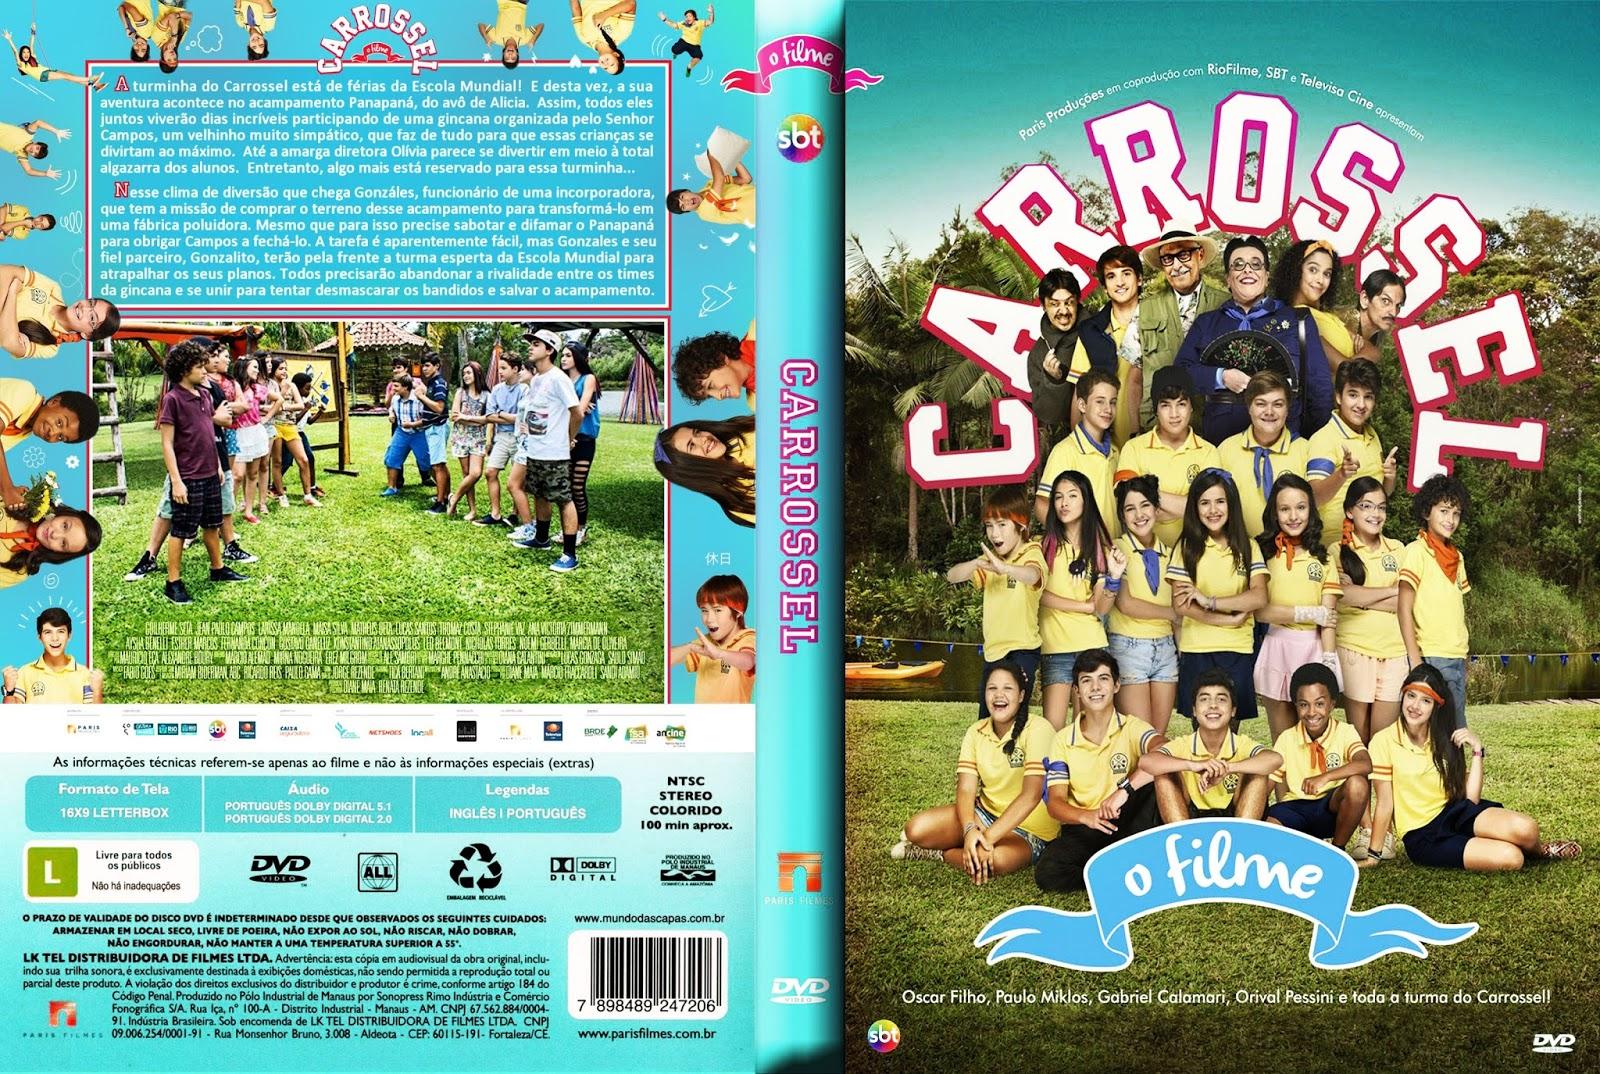 Download Carrossel O Filme DVDRip XviD Nacional gallery 175 9 614974